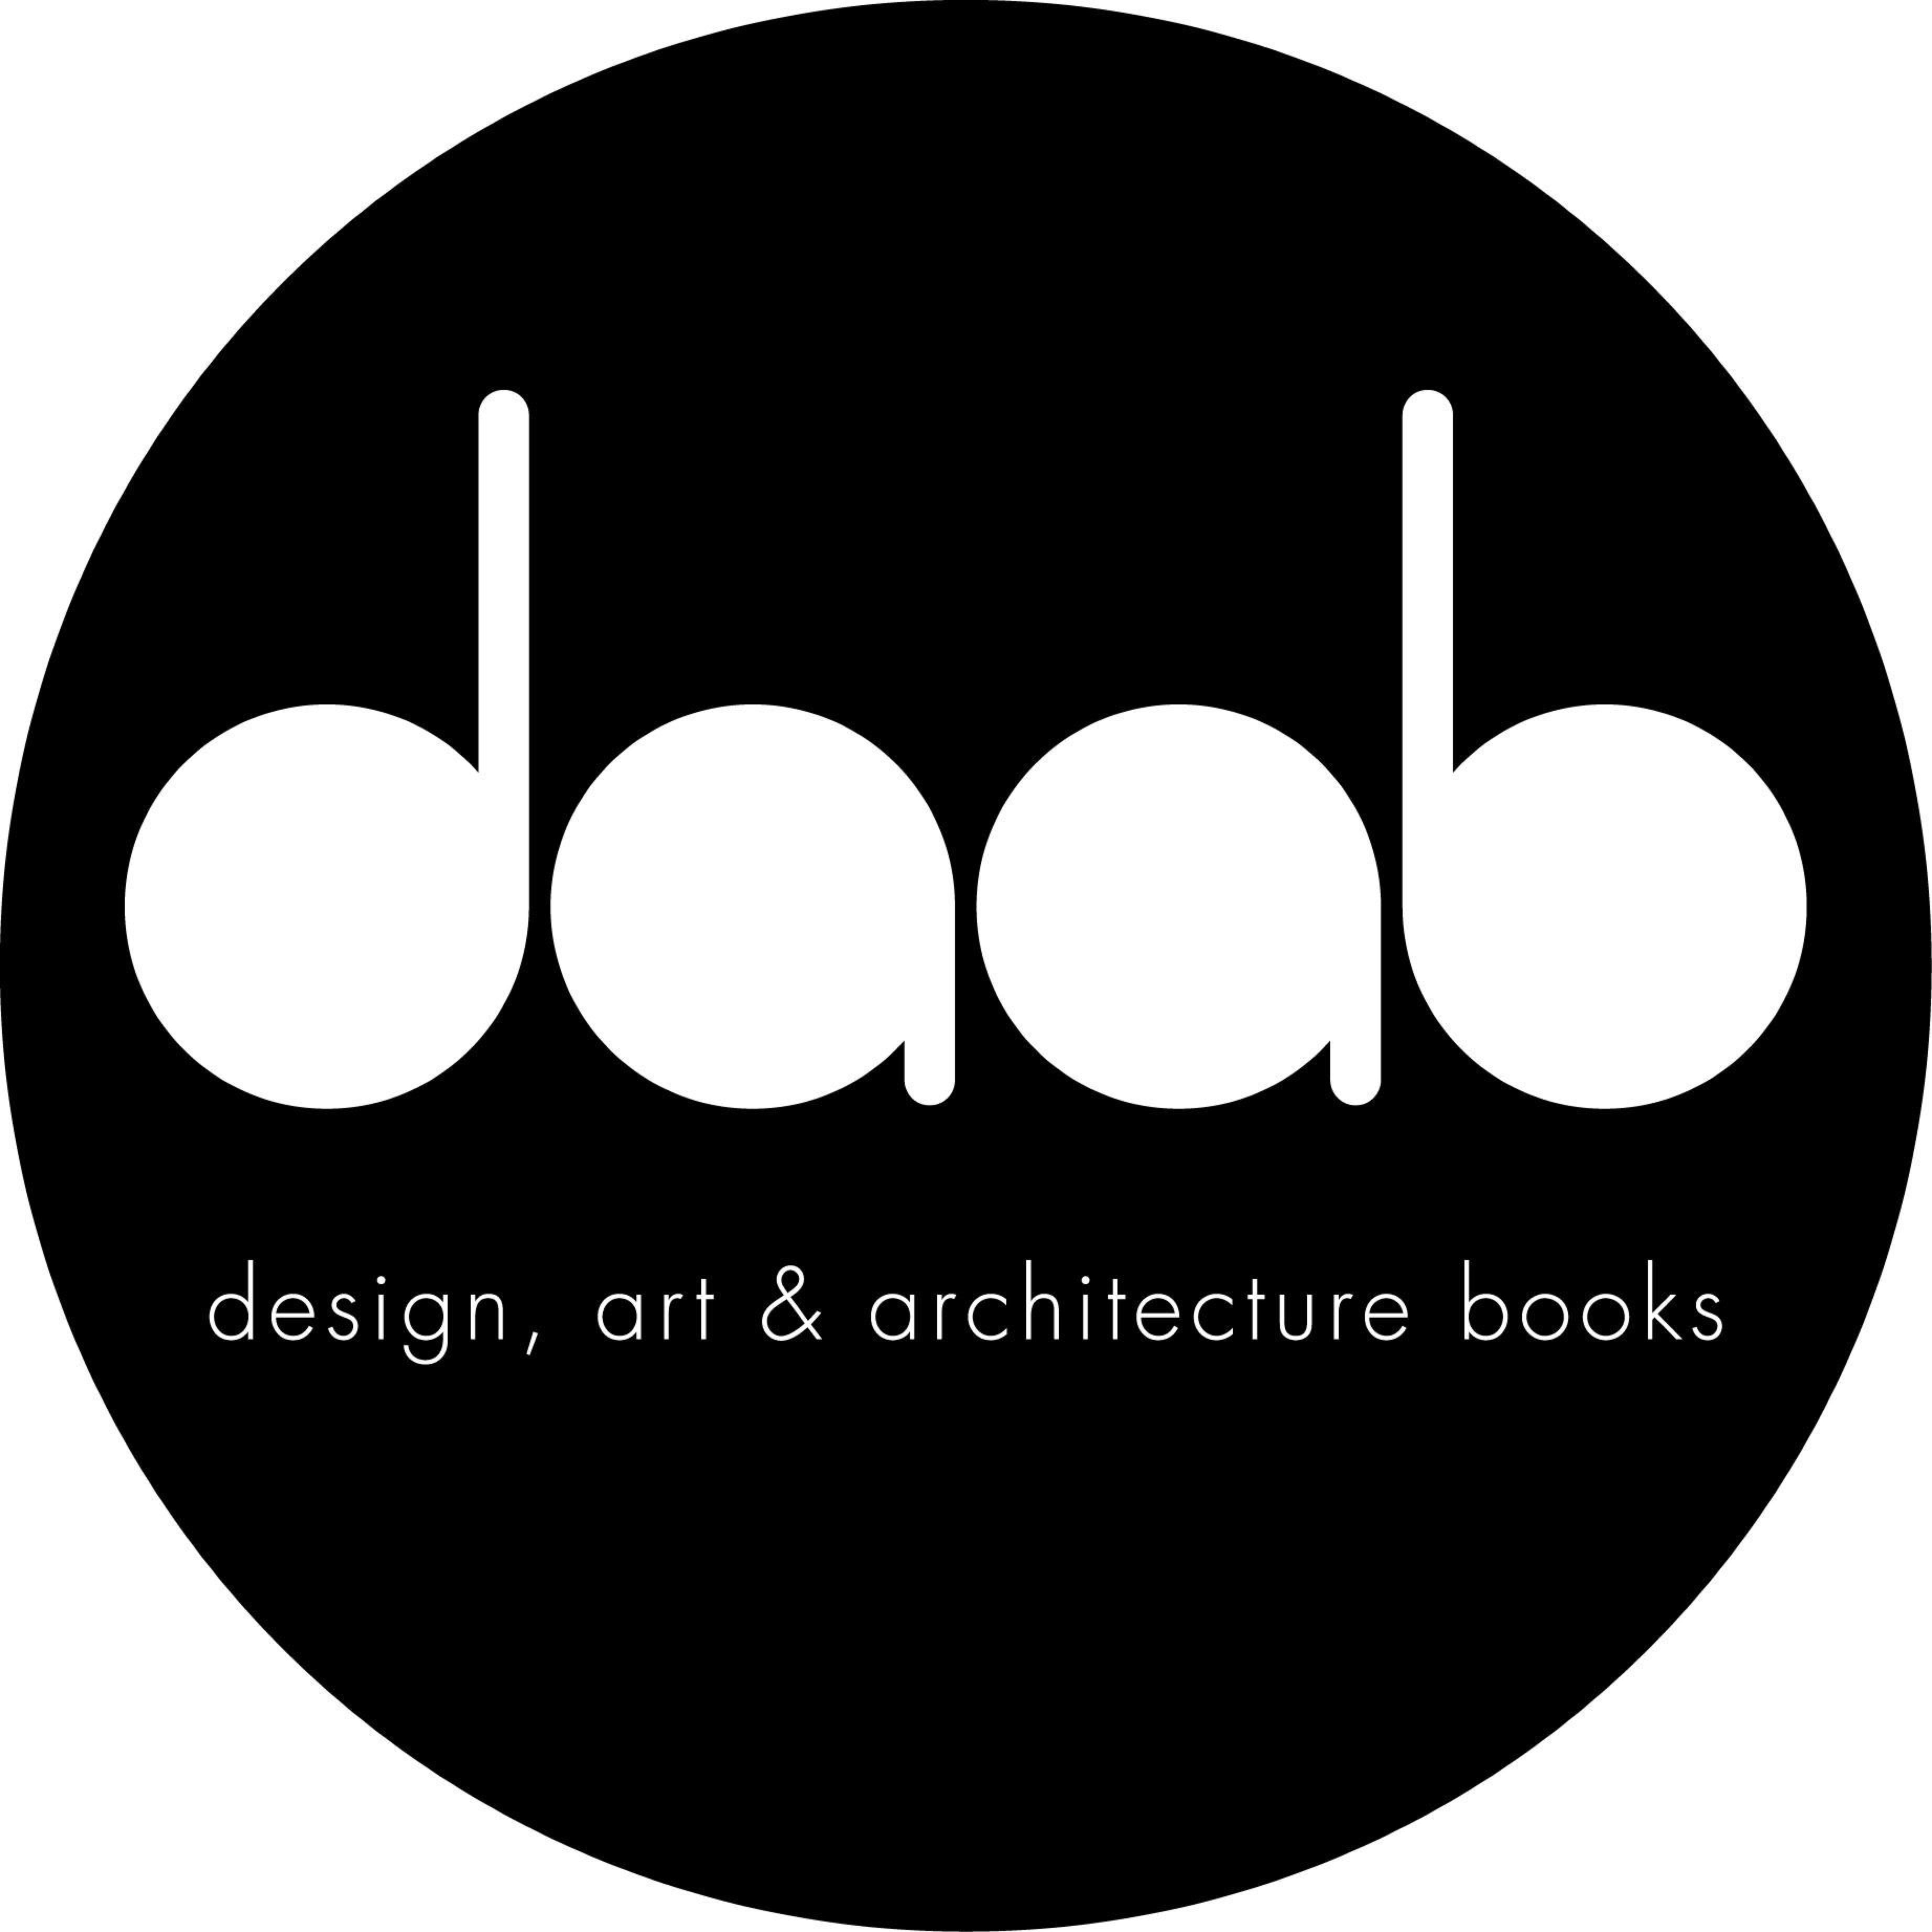 DAAB PUBLISHING (2007—2009)